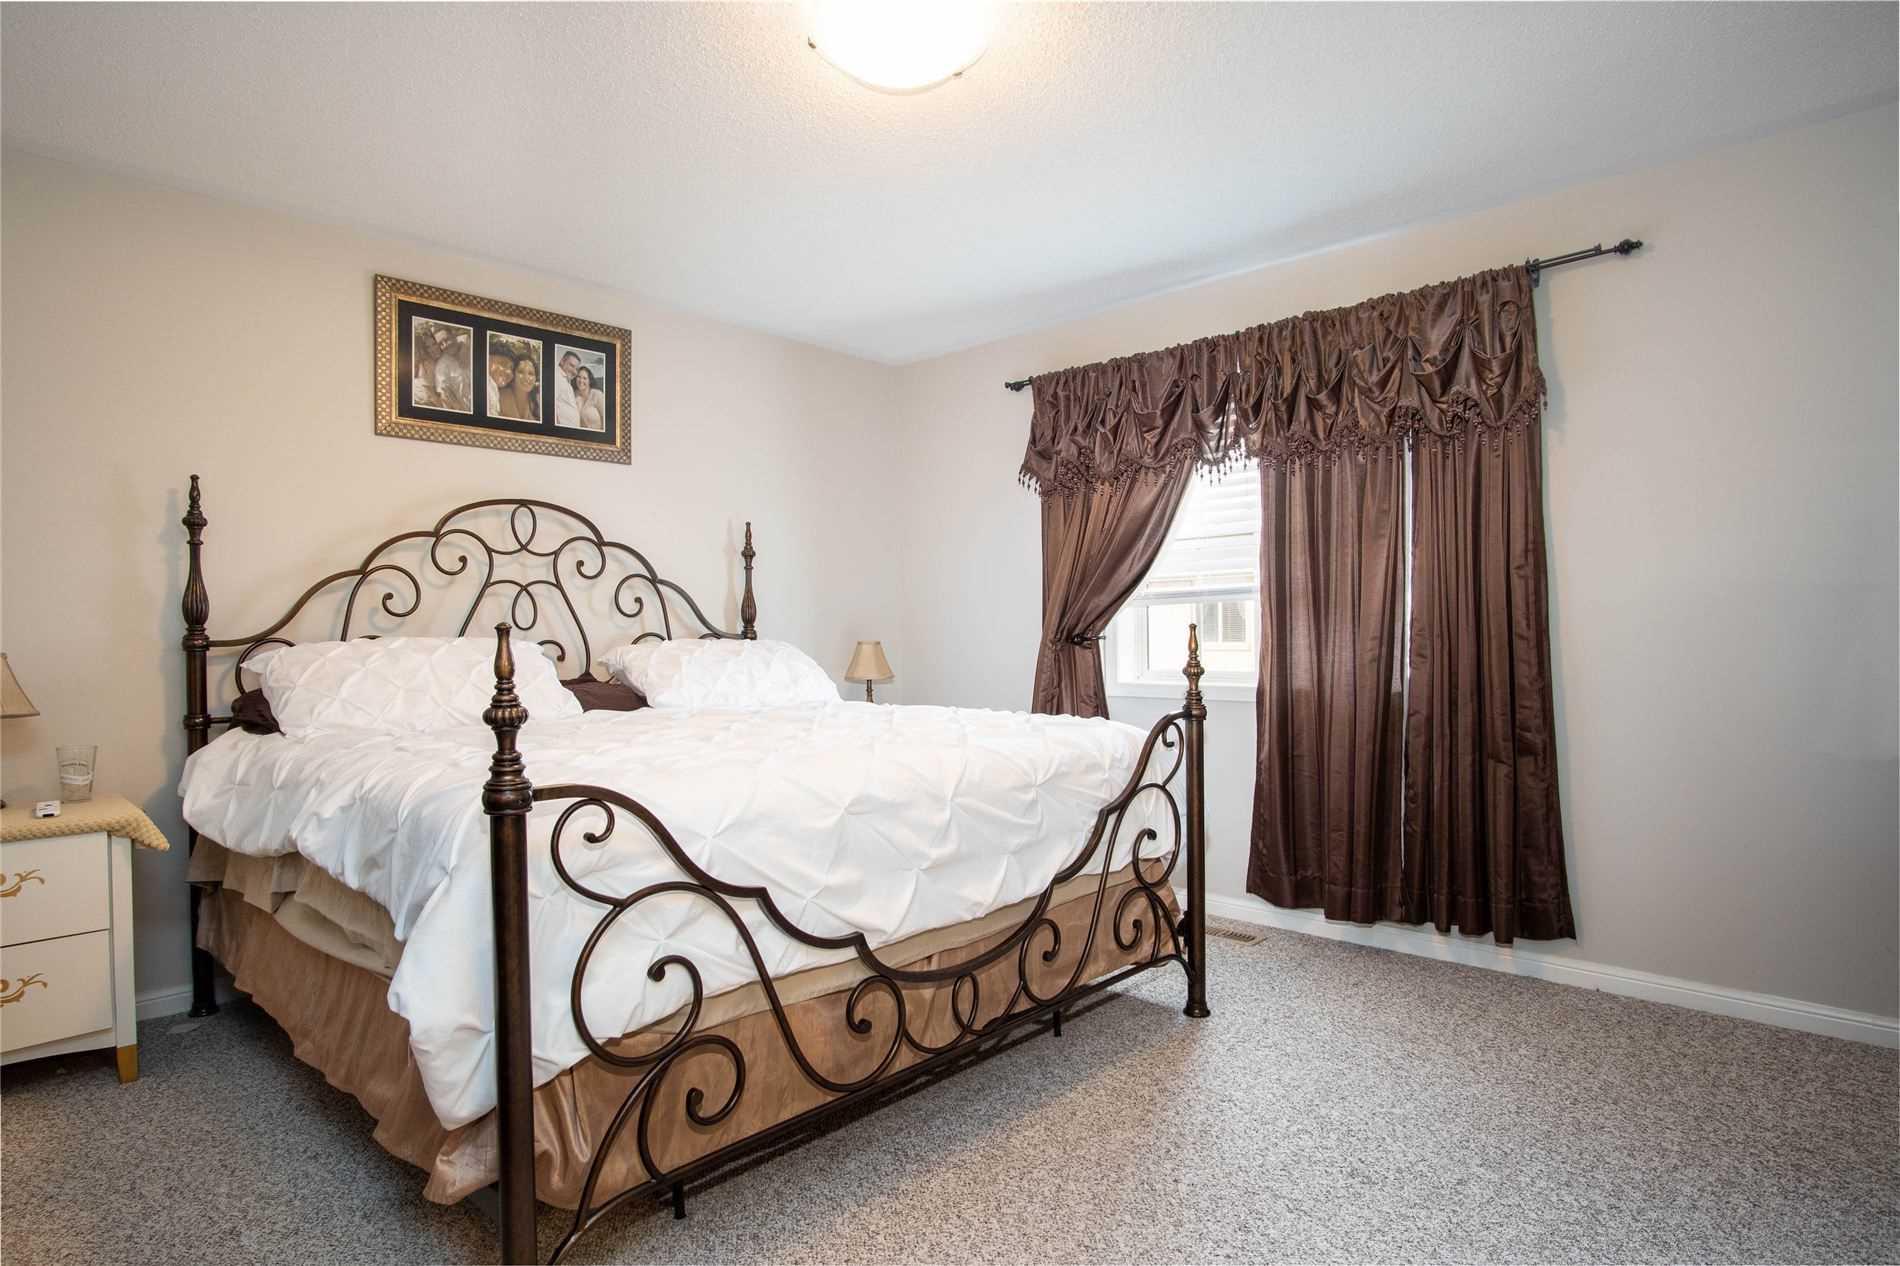 827 Biggar Hts - Coates Detached for sale, 4 Bedrooms (W5400280) - #20